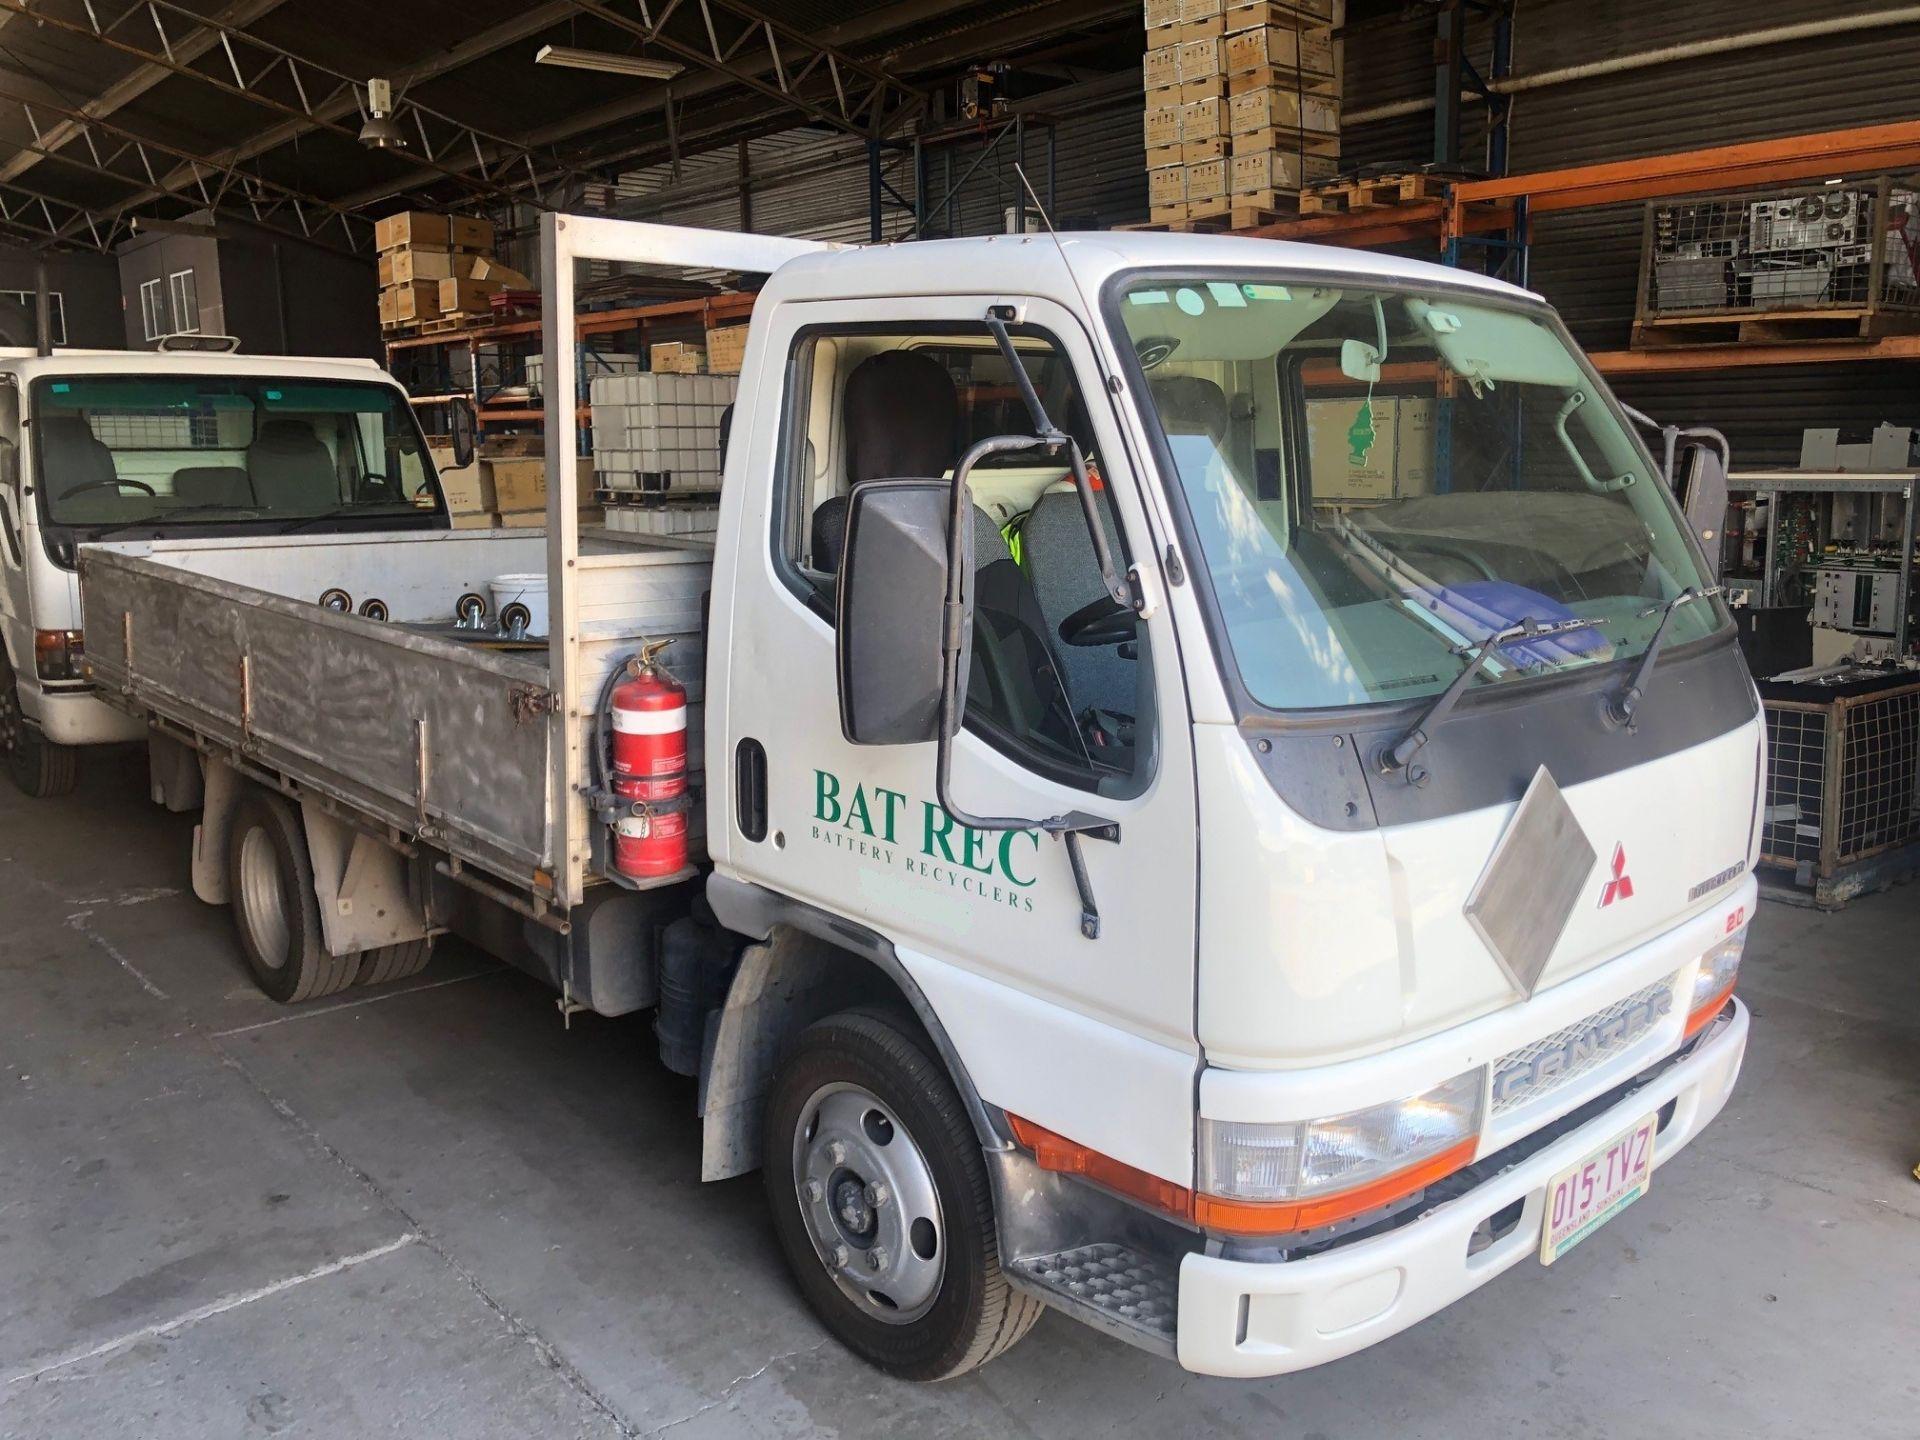 Established Recycling Business providing fantastic cash flow